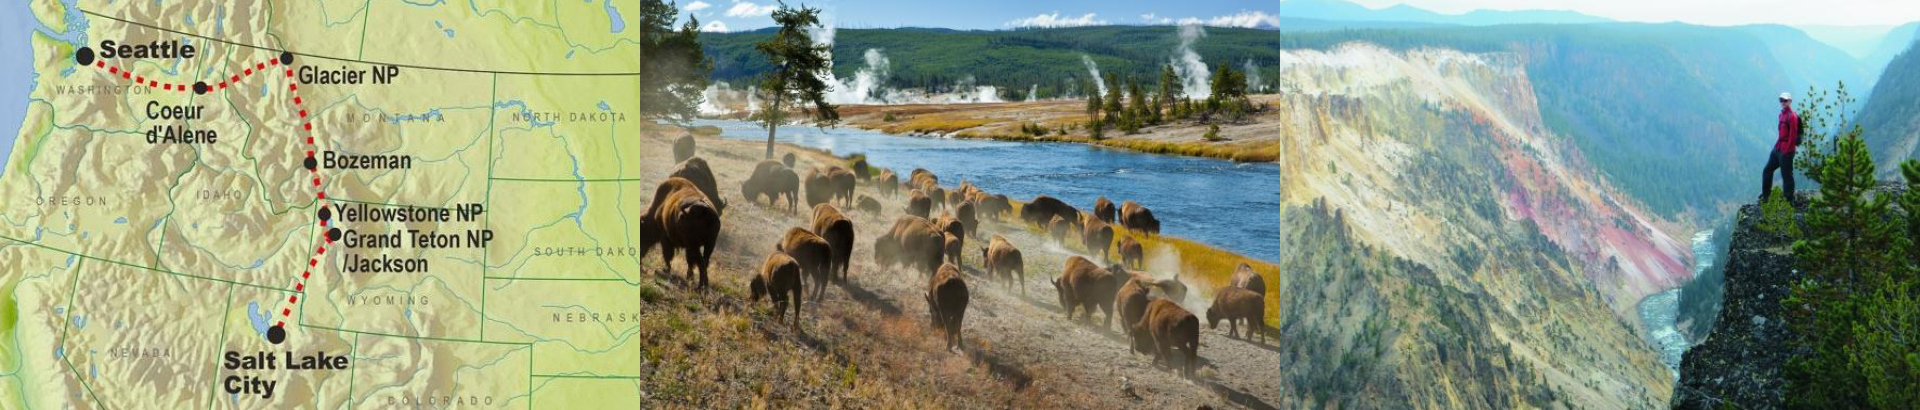 bilde-over-tilbud-1920x410-yellowstone-wildlife-trails